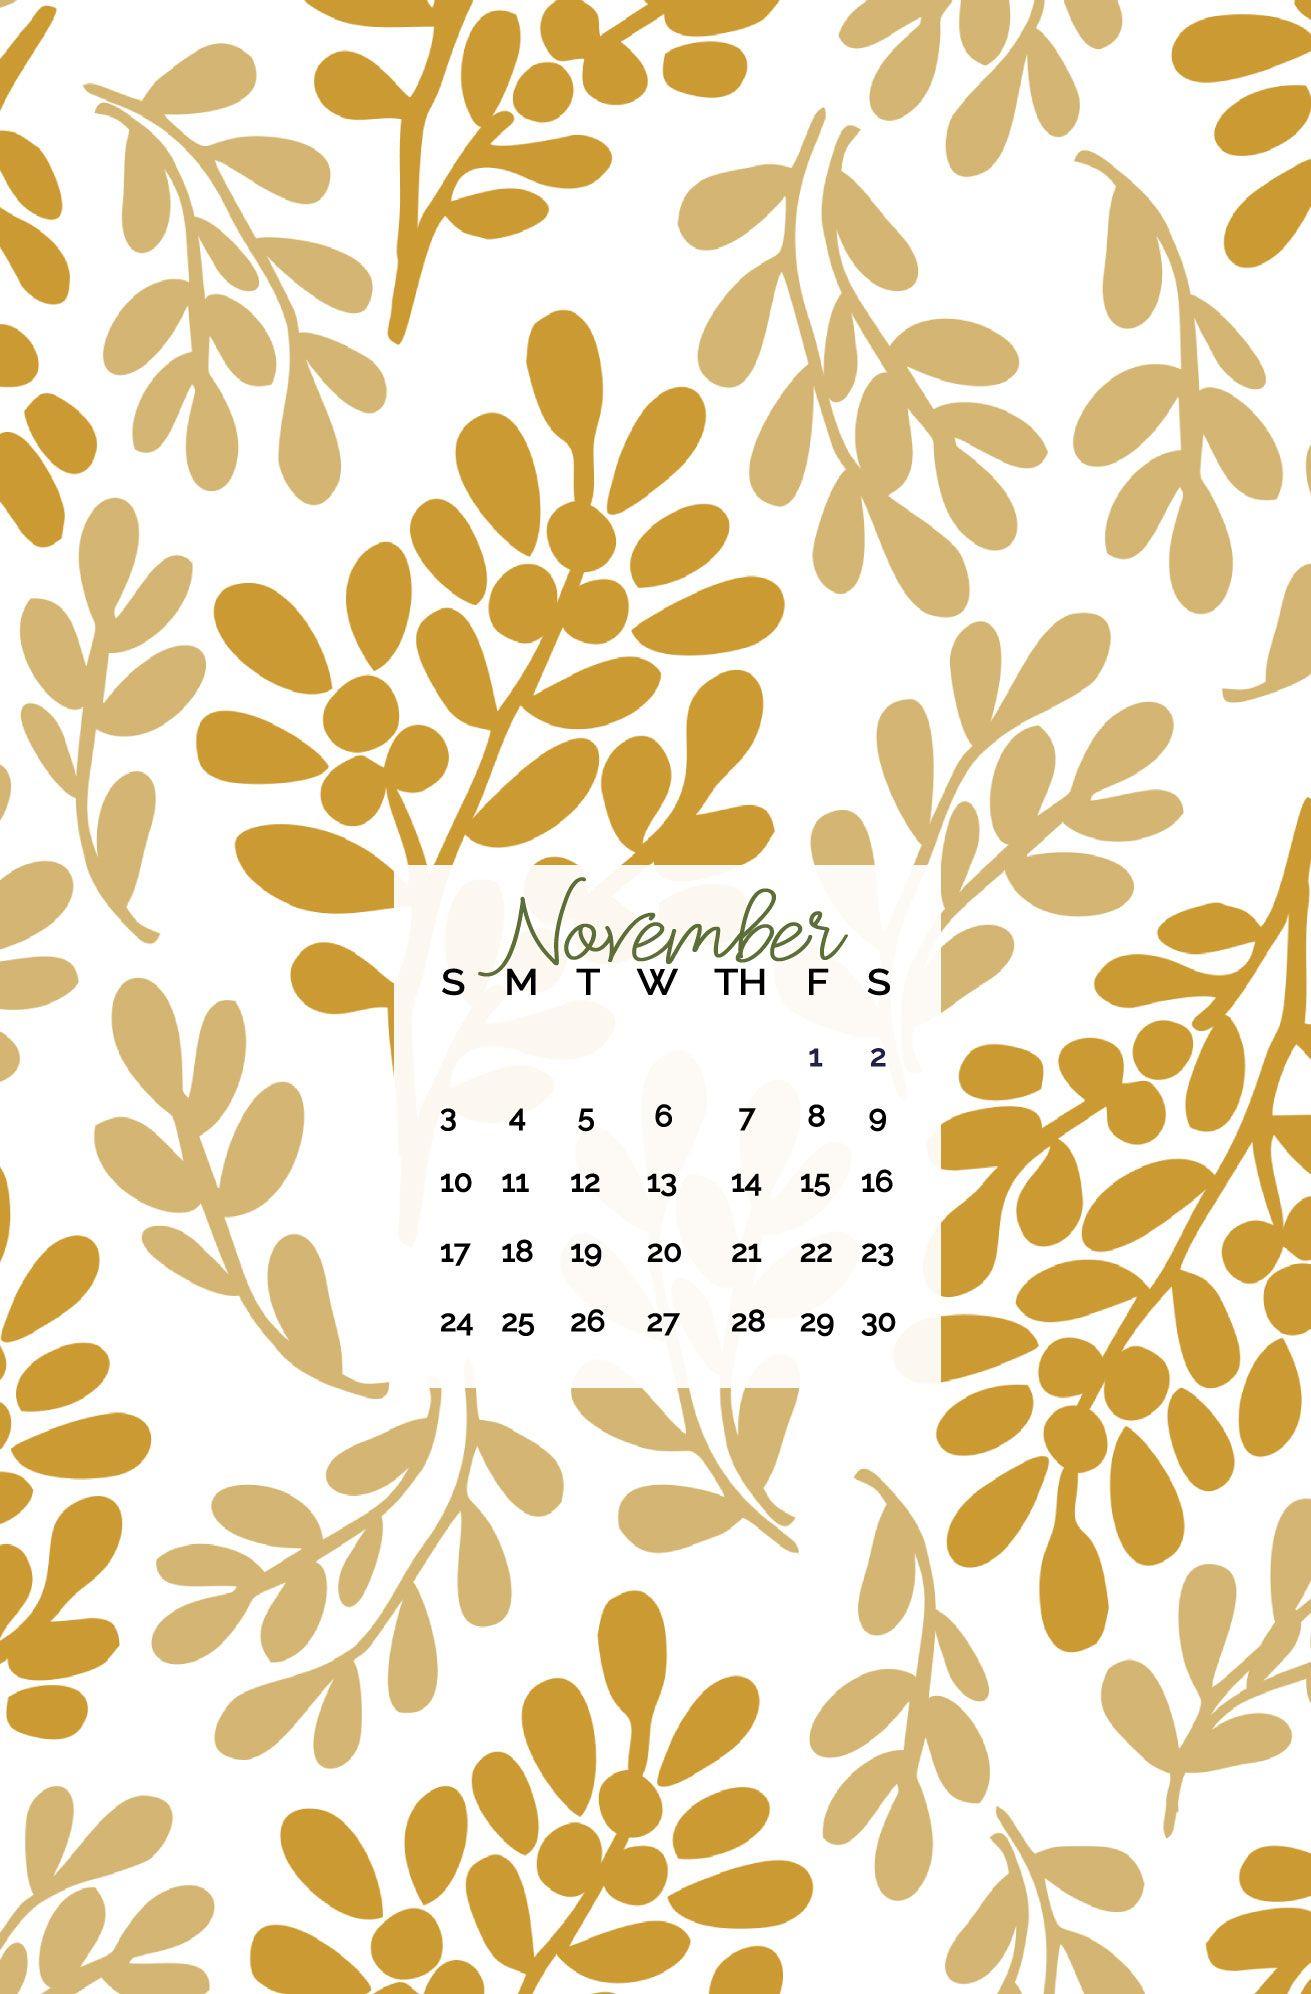 Floral November calendar iPhone wallpaper Iphone